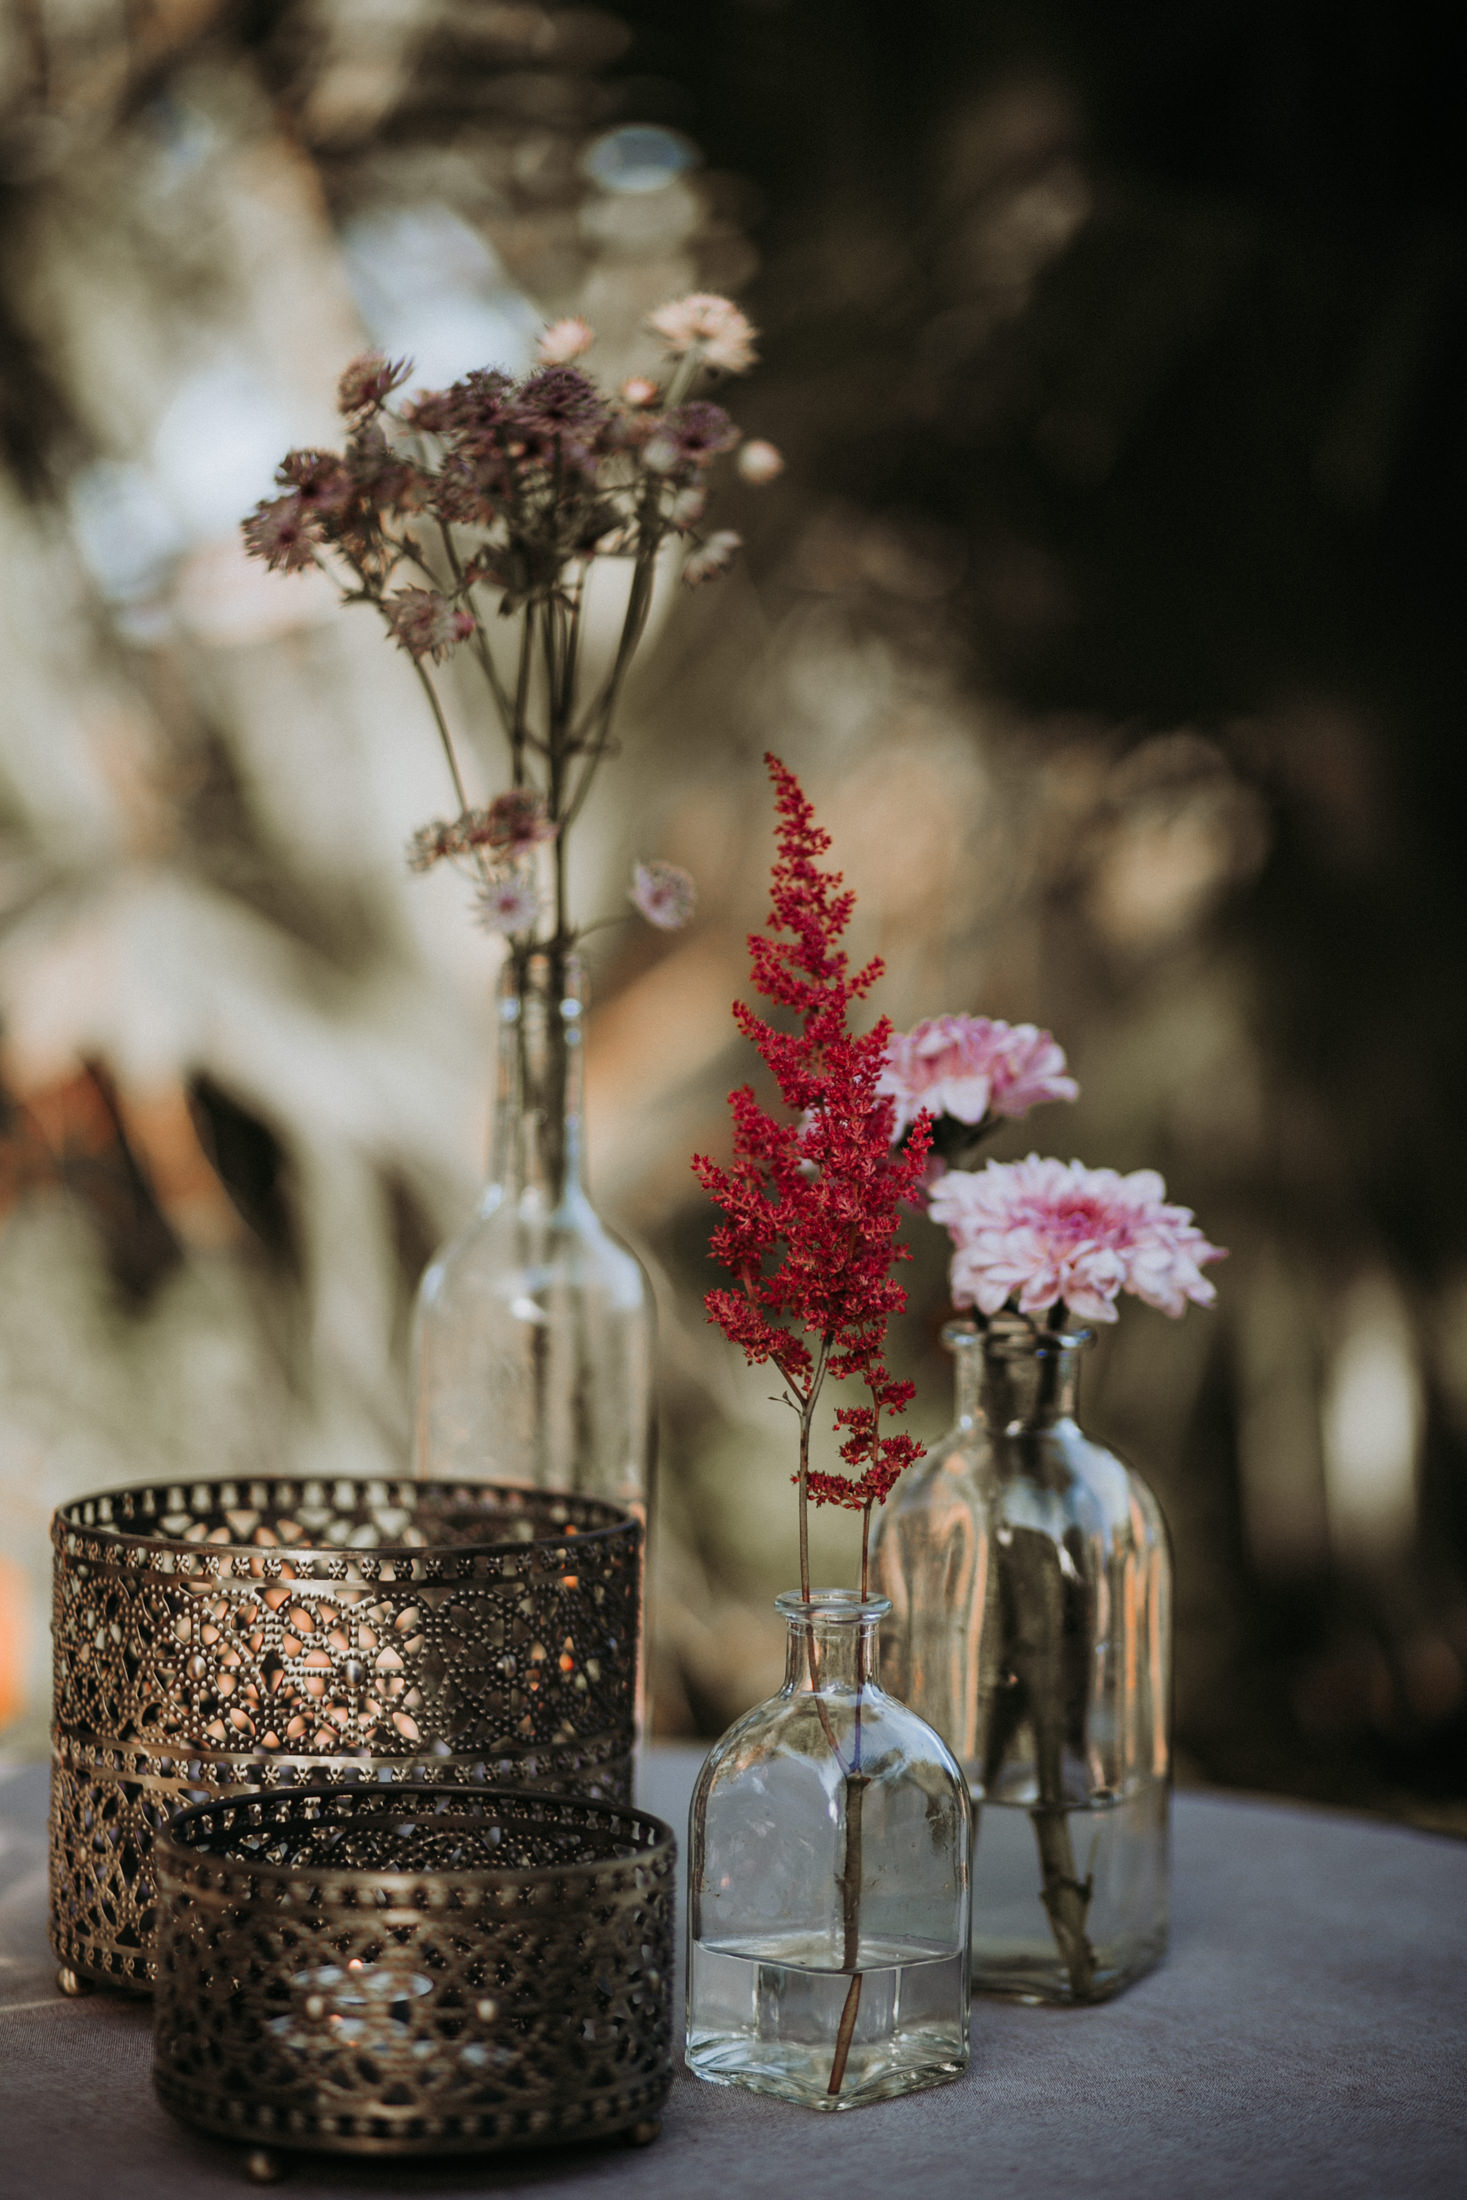 Wedding_Photographer_Mallorca_Daniela-Marquardt_Photography_New_York_Iceland_Tuscany_Santorini_Portugal_Austria_Bavaria_Elopement_Hochzeitsfotograf_AntjeRajat1_34